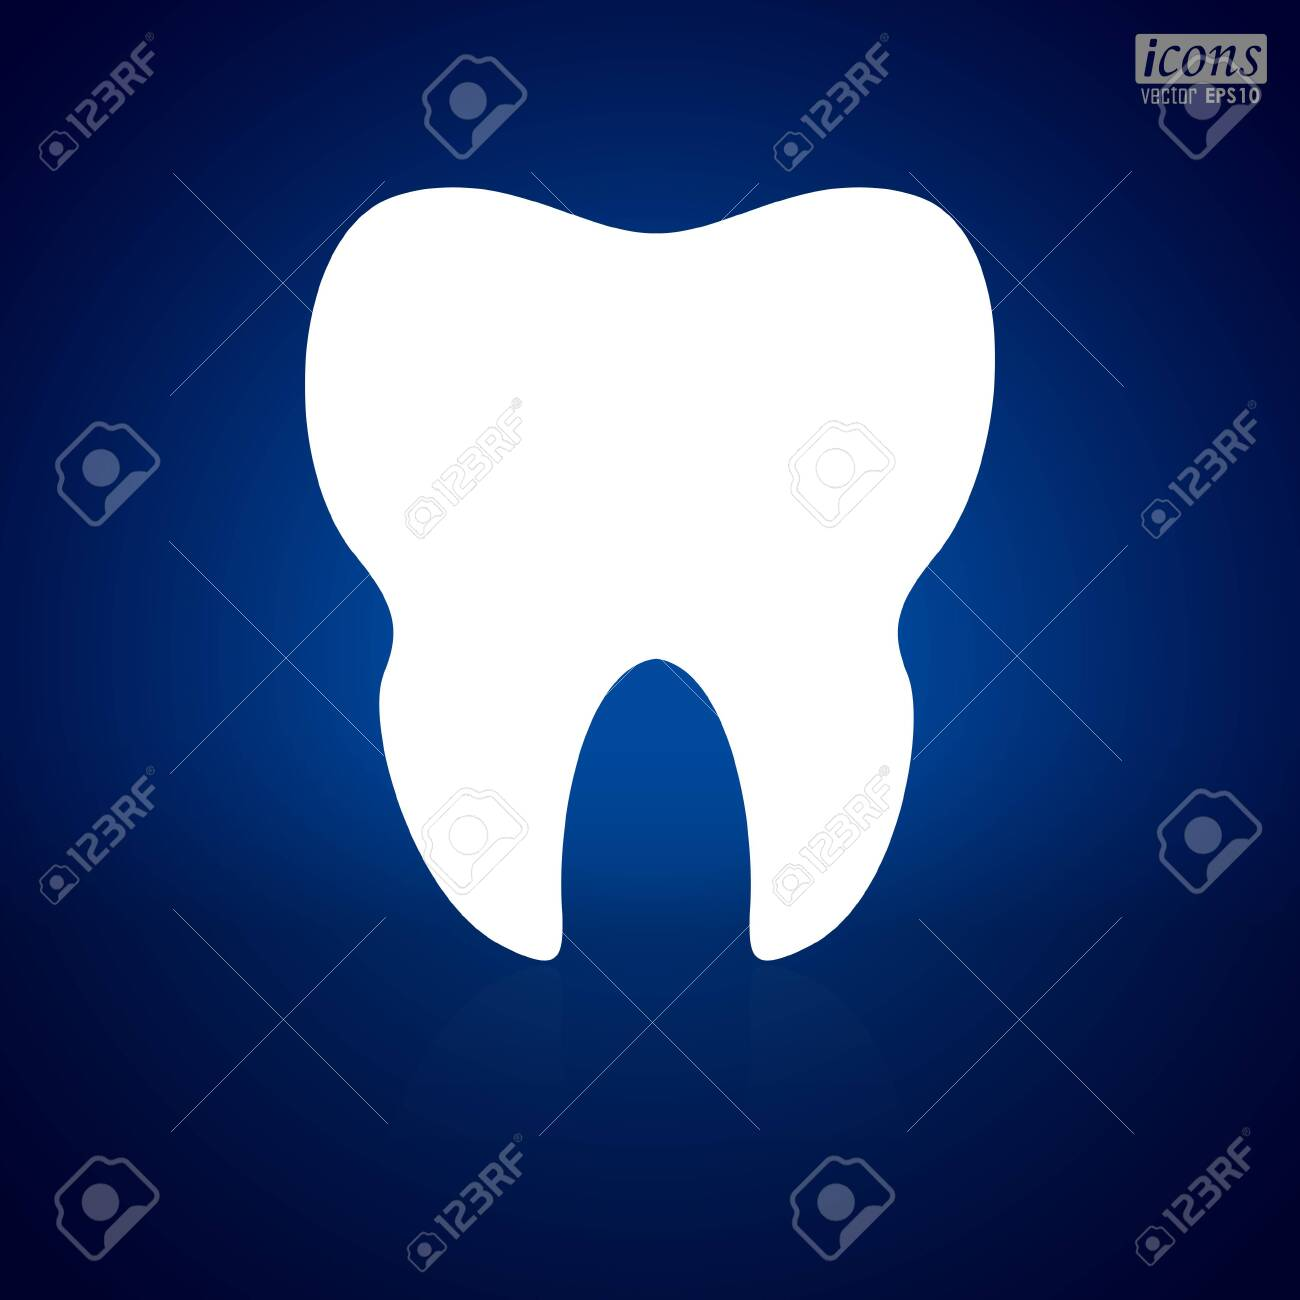 Human Teeth icon vector illustration - 143672284